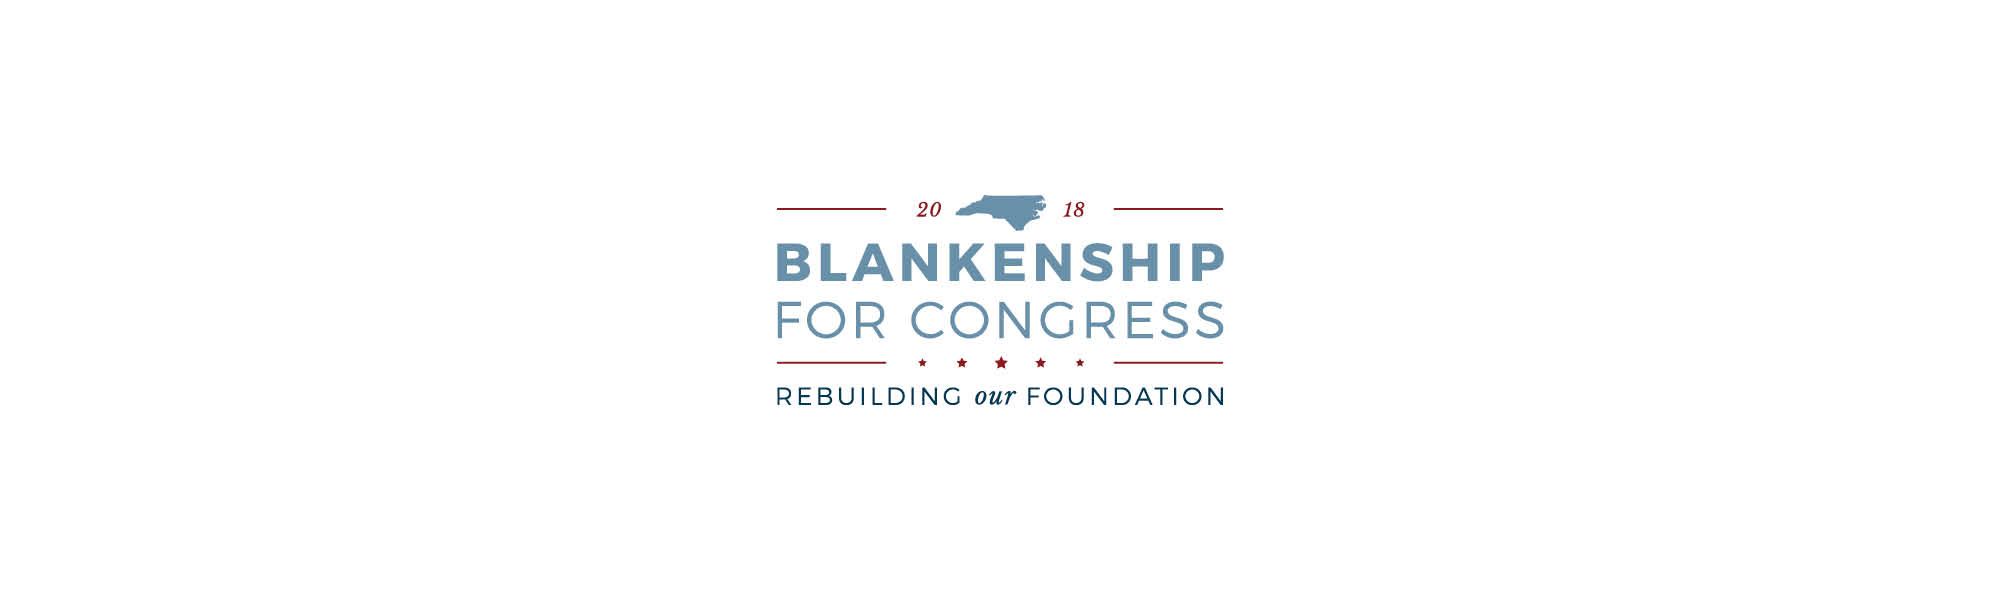 Blankenship for Congress | Logo by Casi Long Design | casilong.com